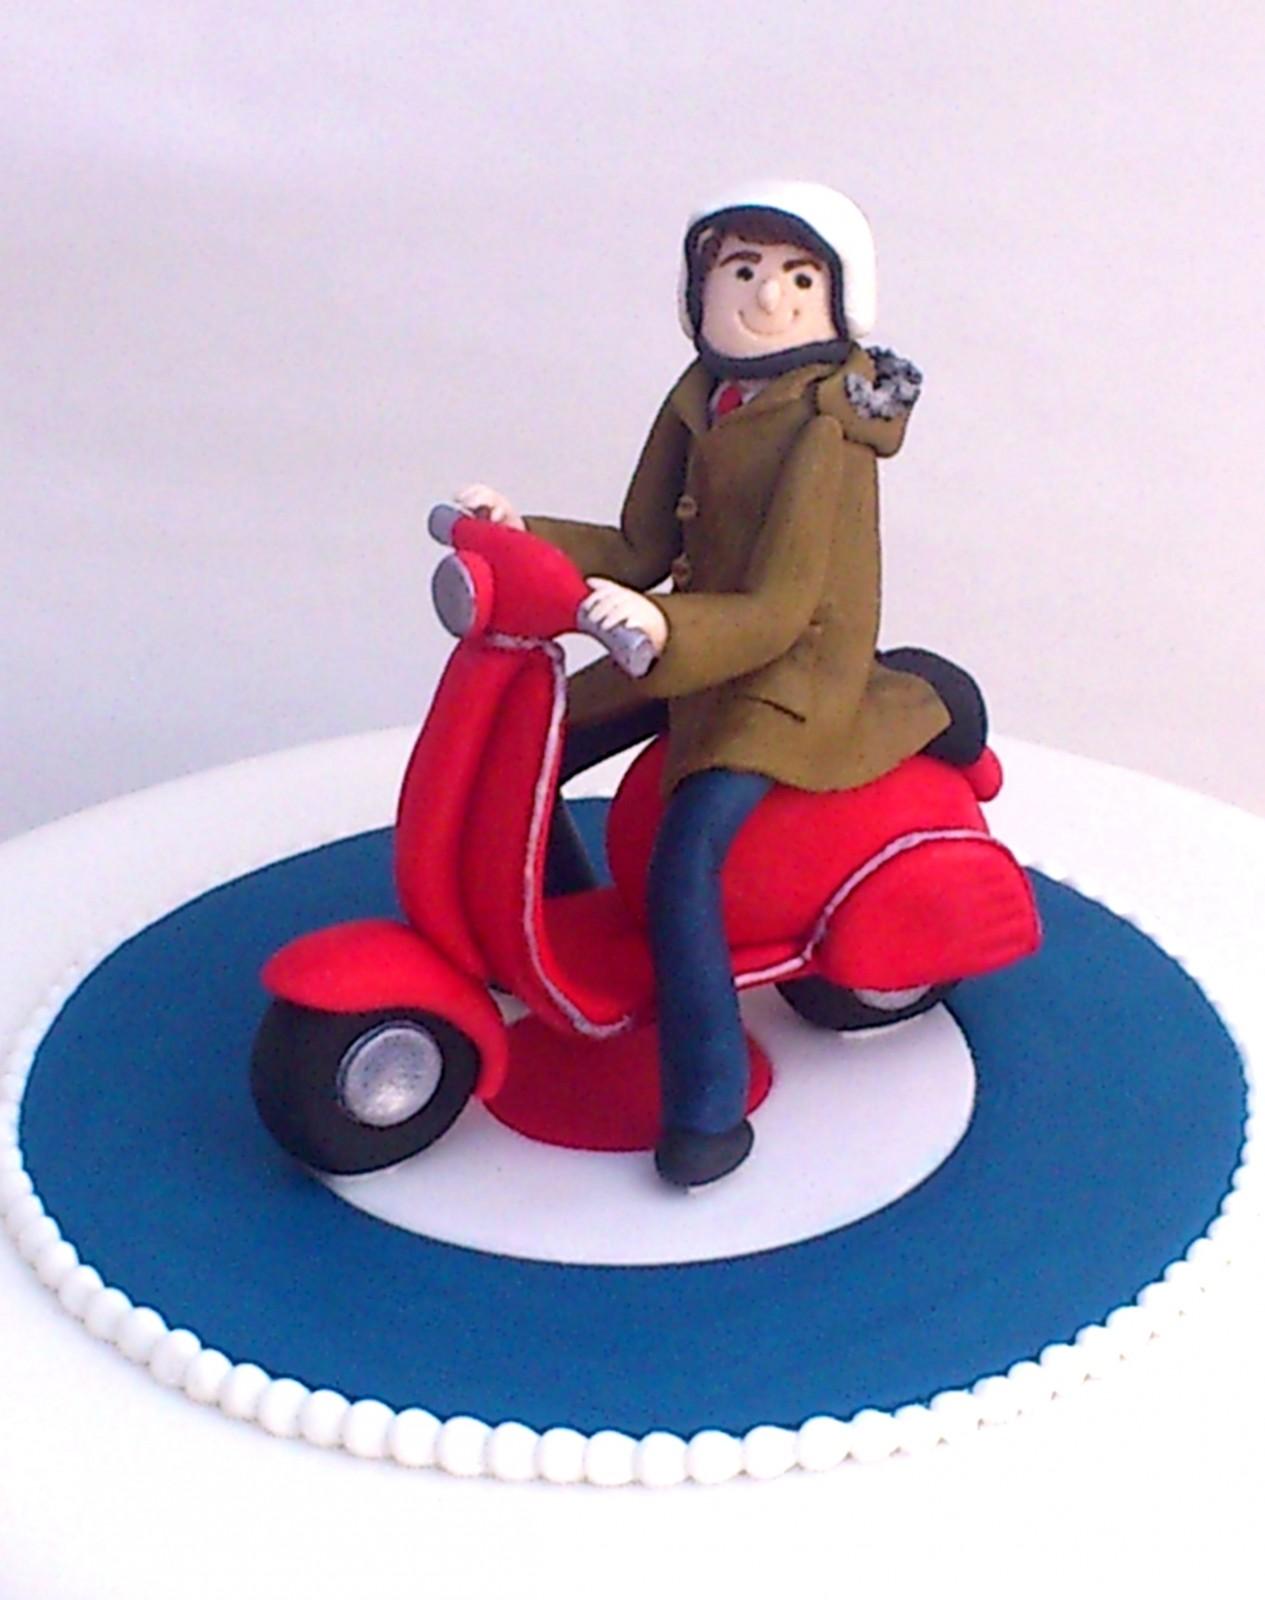 Birthday Cake Vespa Image Inspiration of Cake and Birthday Decoration